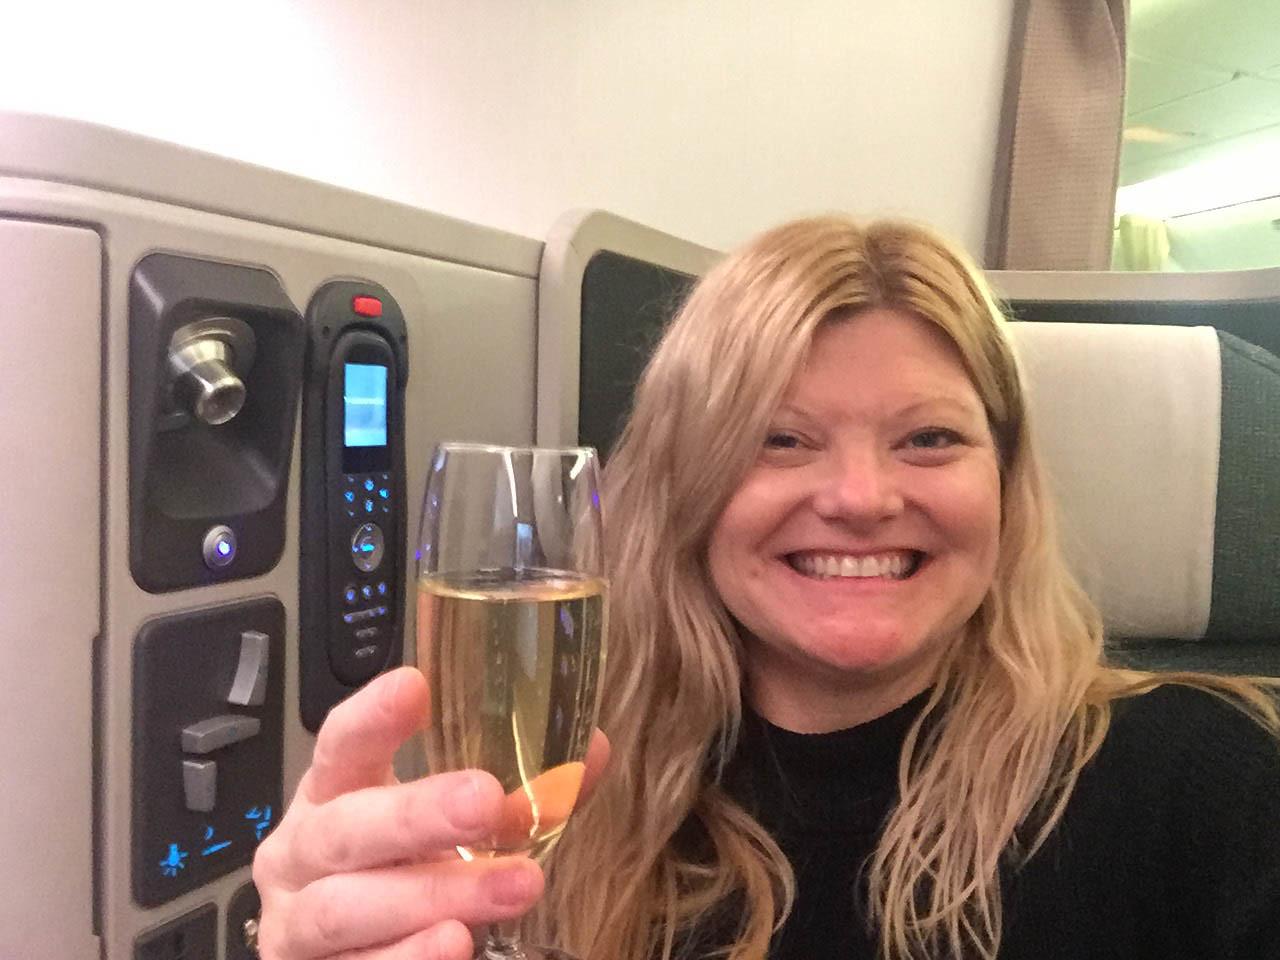 Cathay Pacific Premium Economy cabin champagne